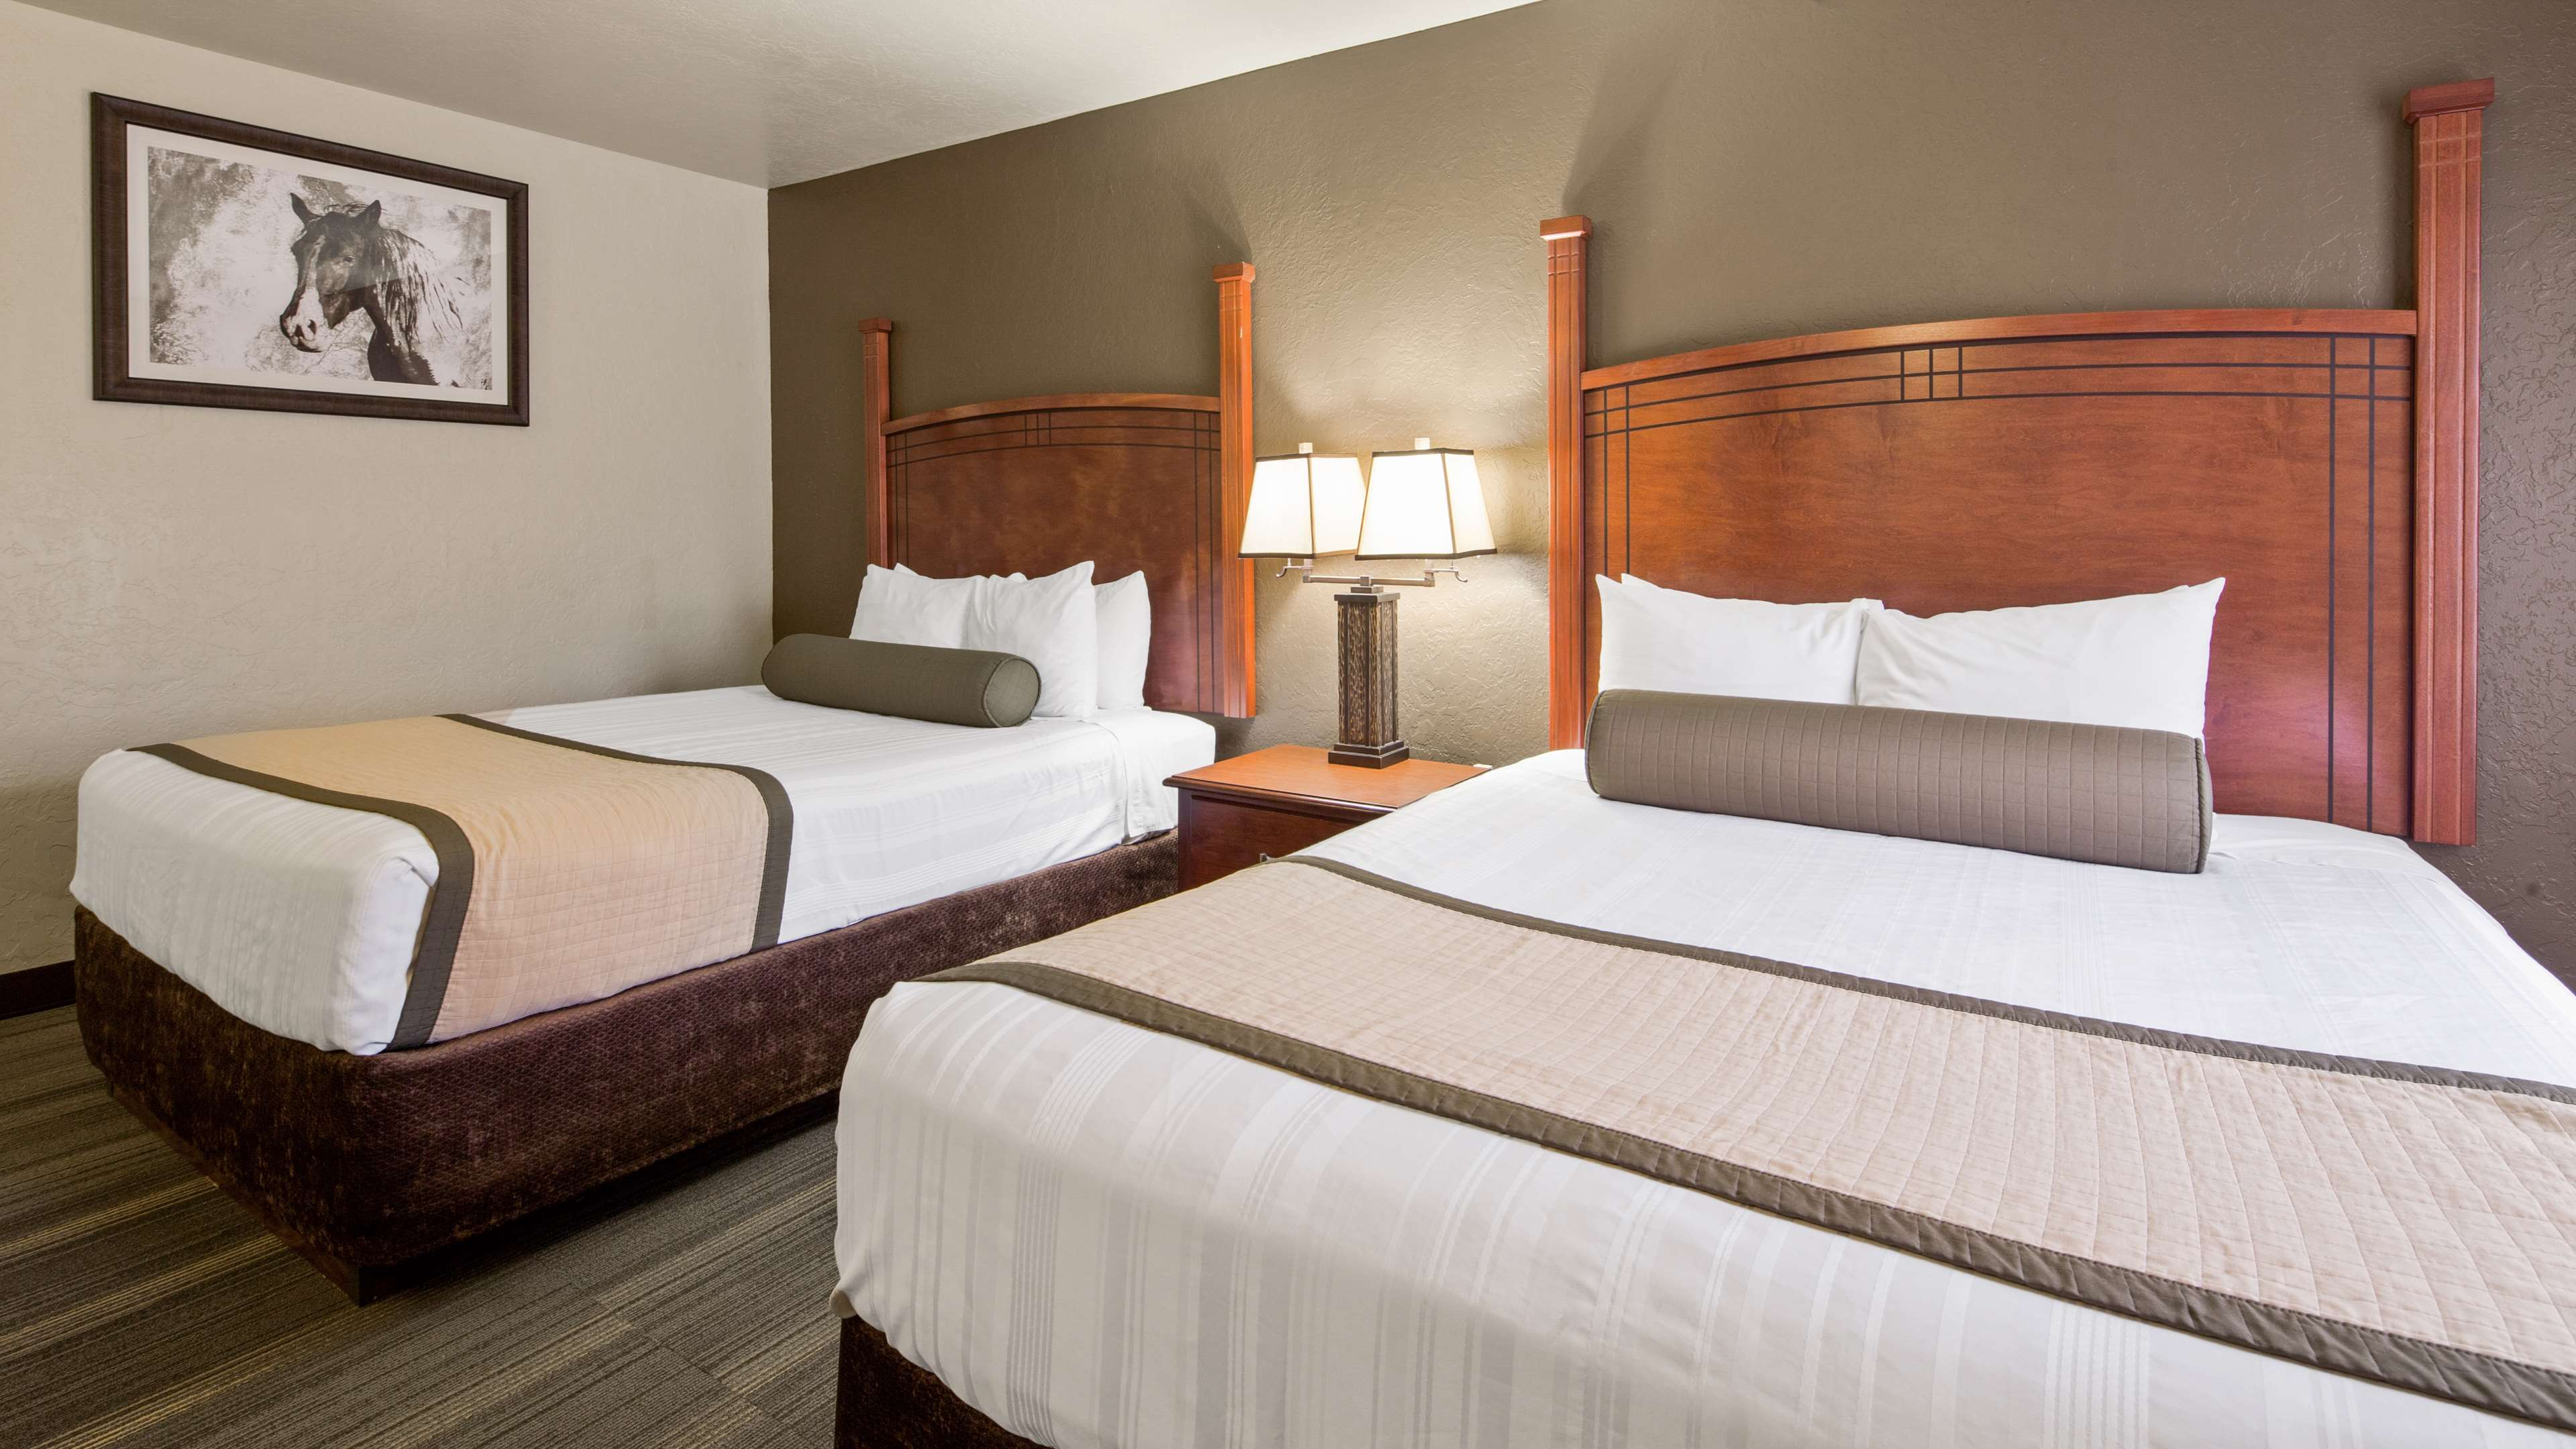 Best Western Plus Lawton Hotel & Convention Center image 12